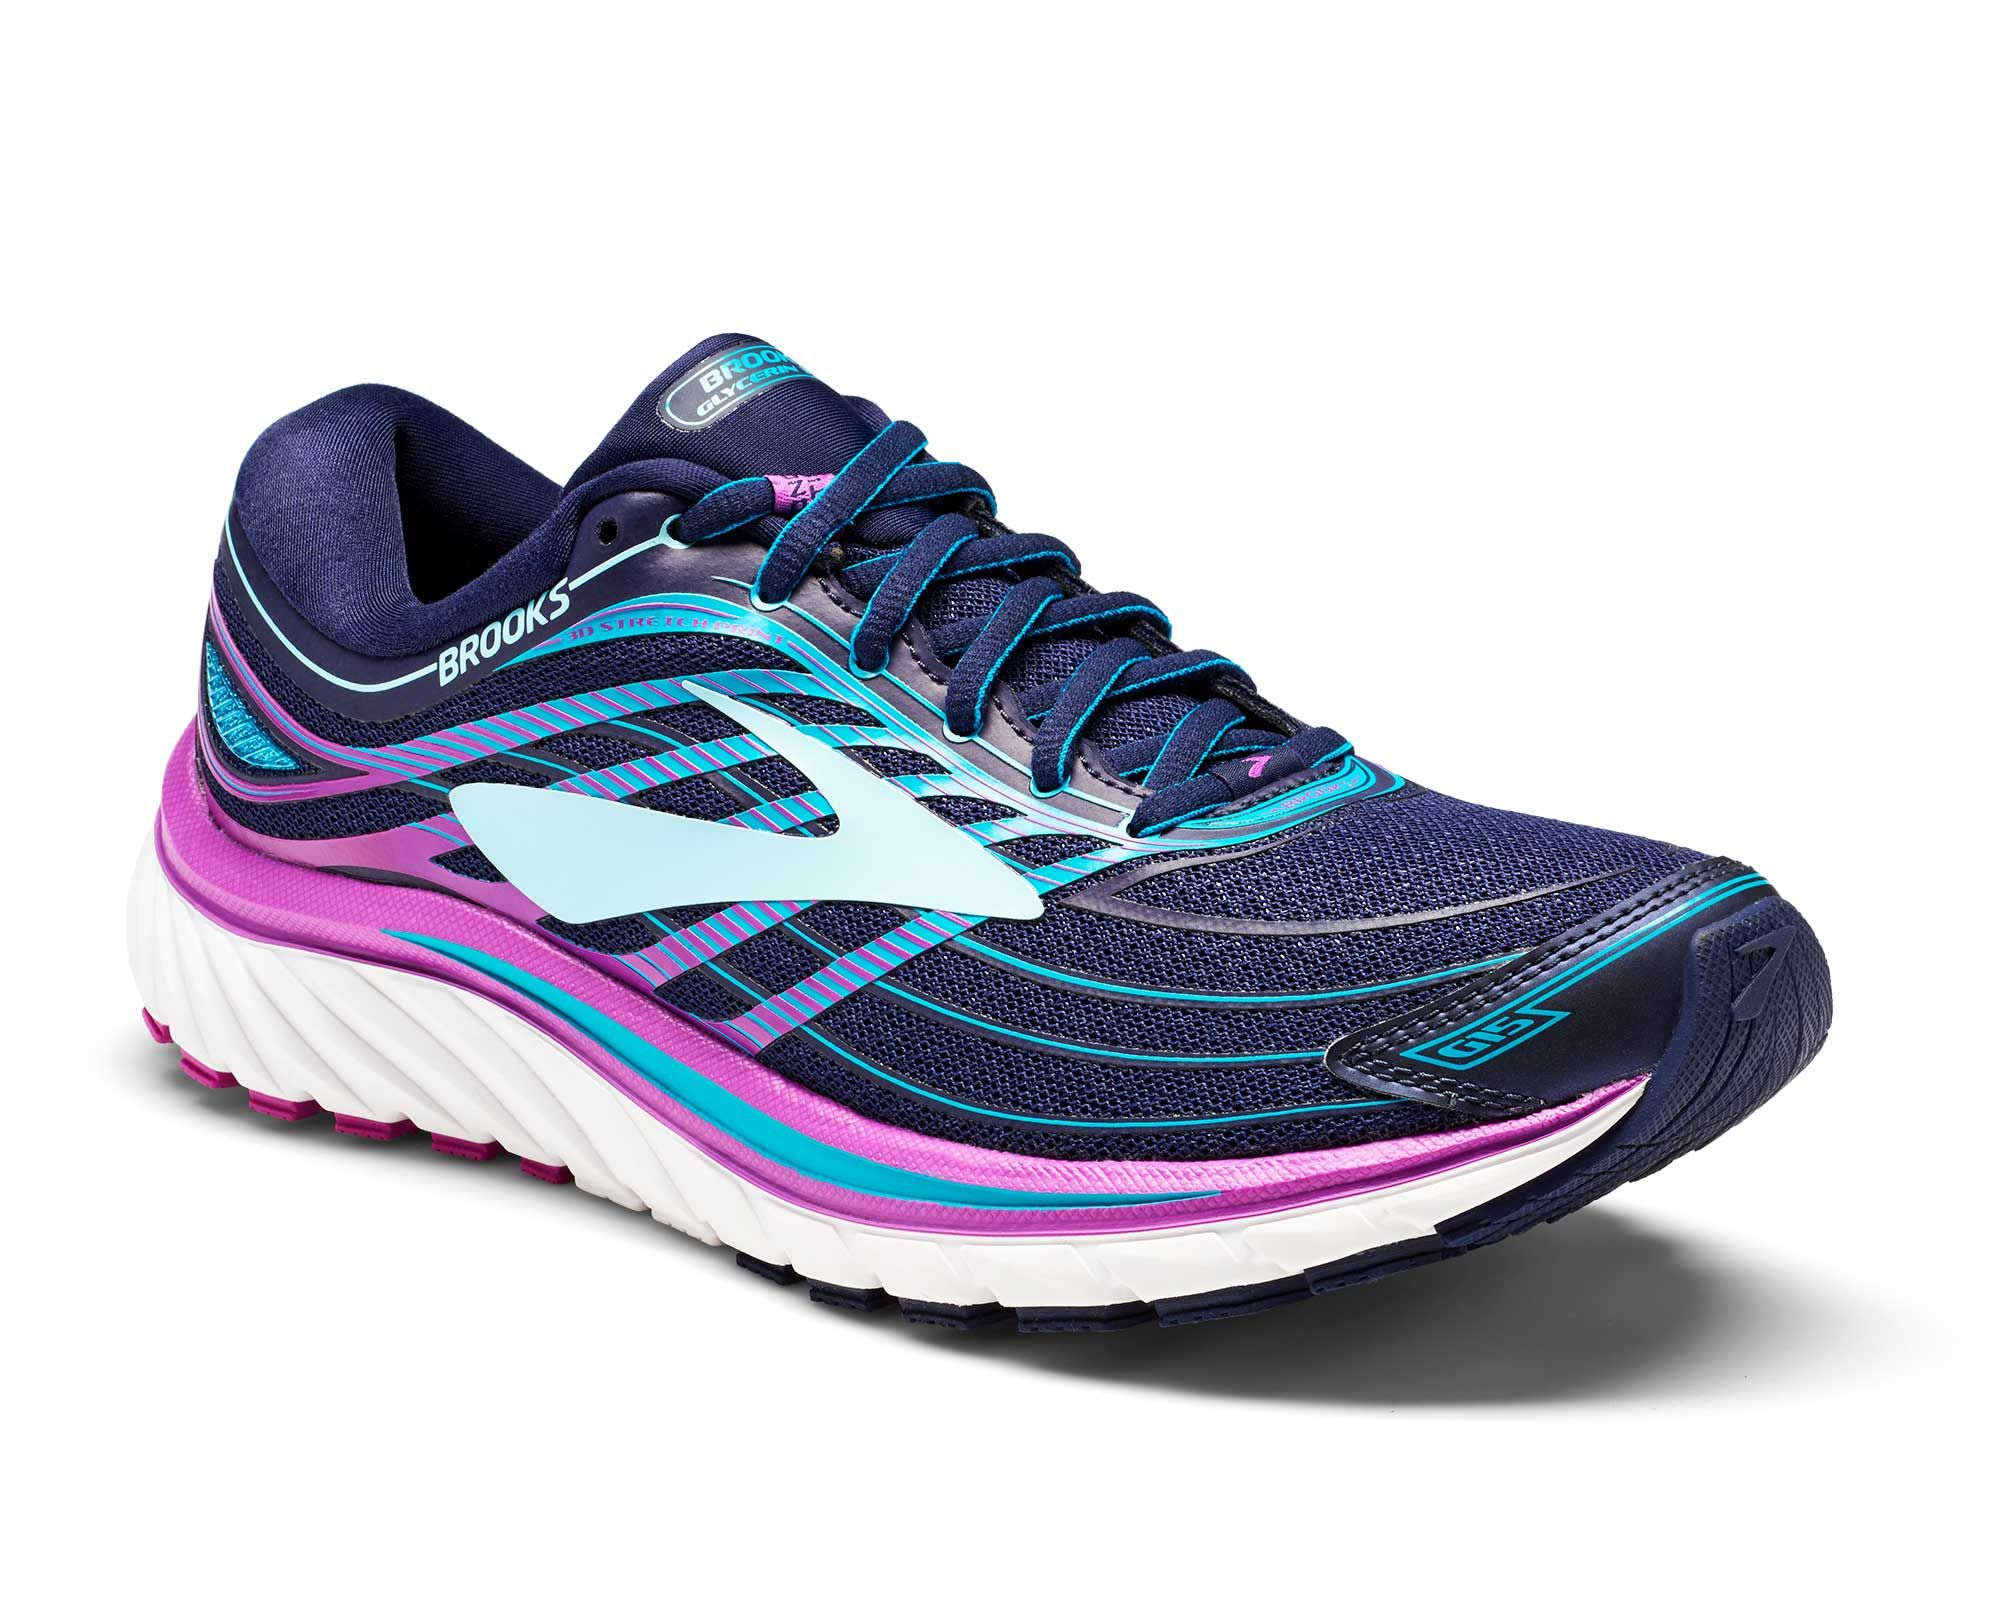 Glycerin 15 Neutral running shoe